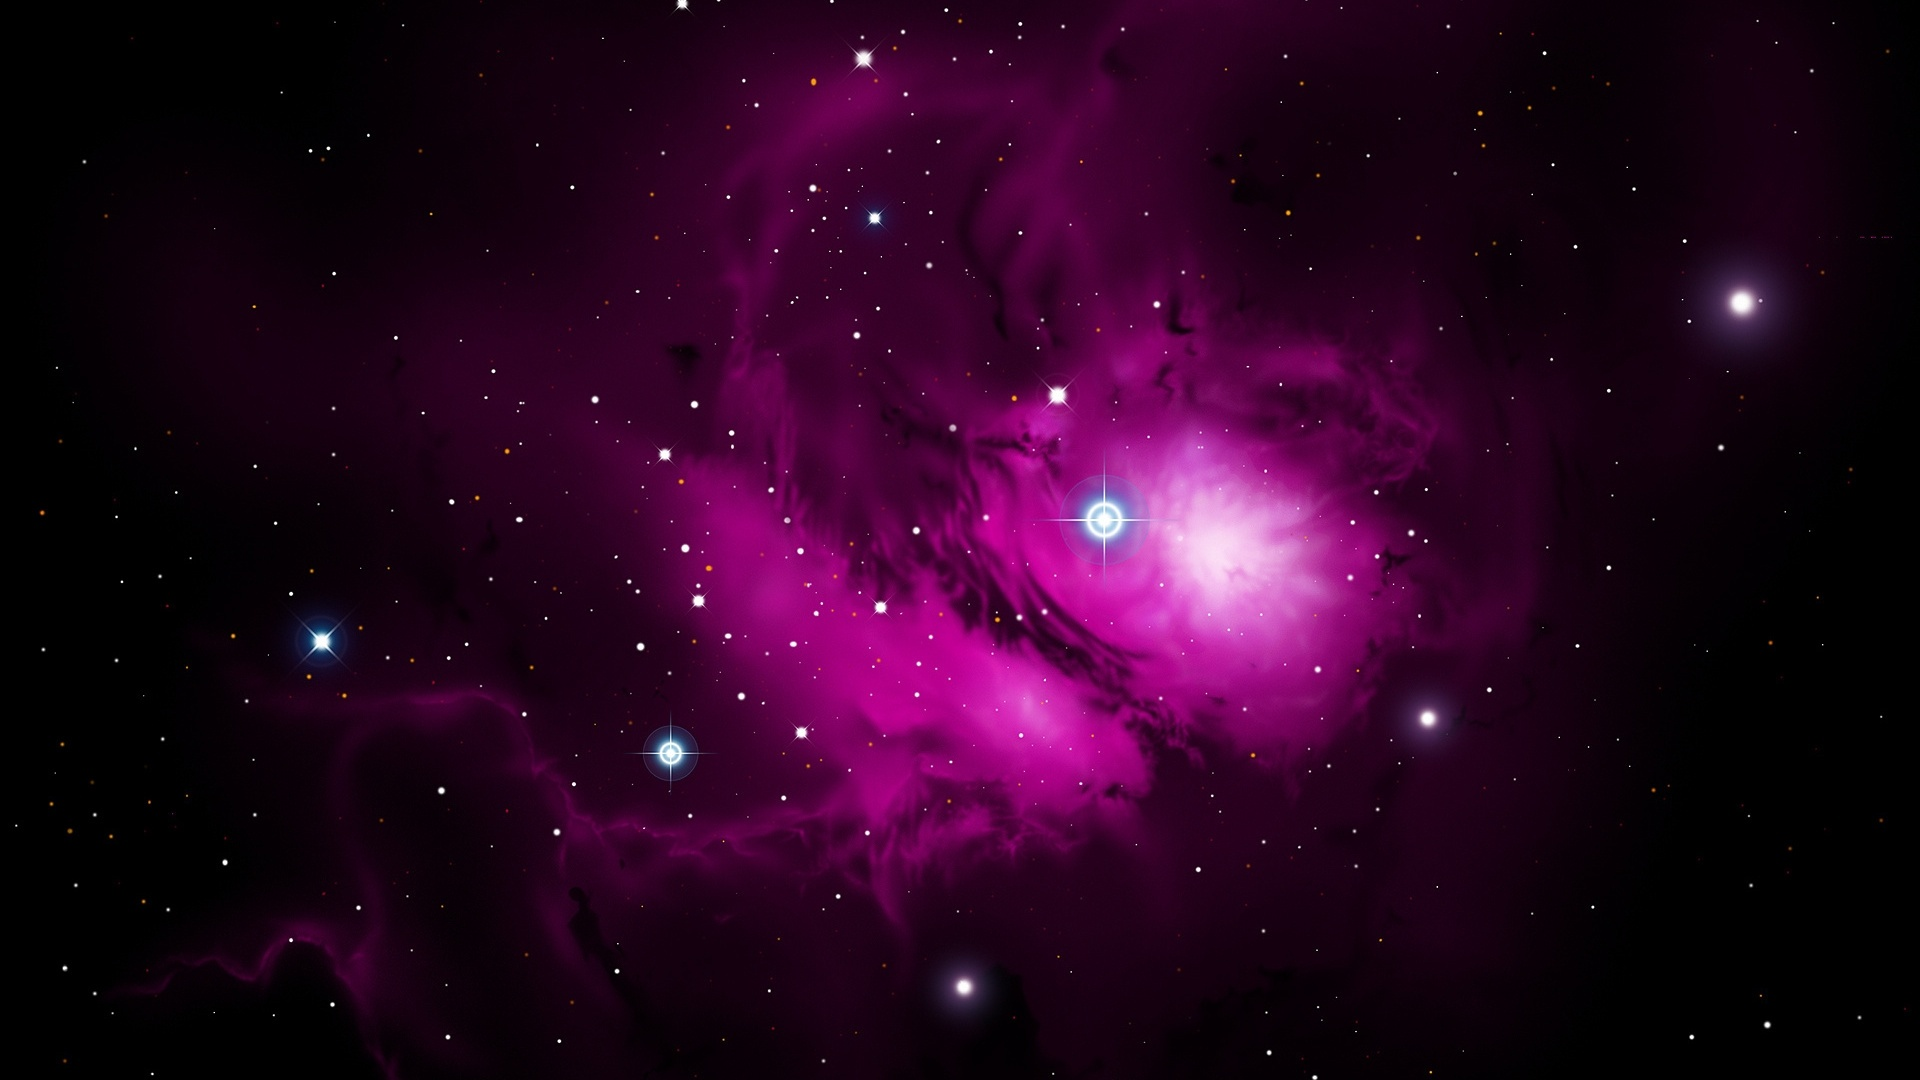 Purple Space wallpaper photo hd